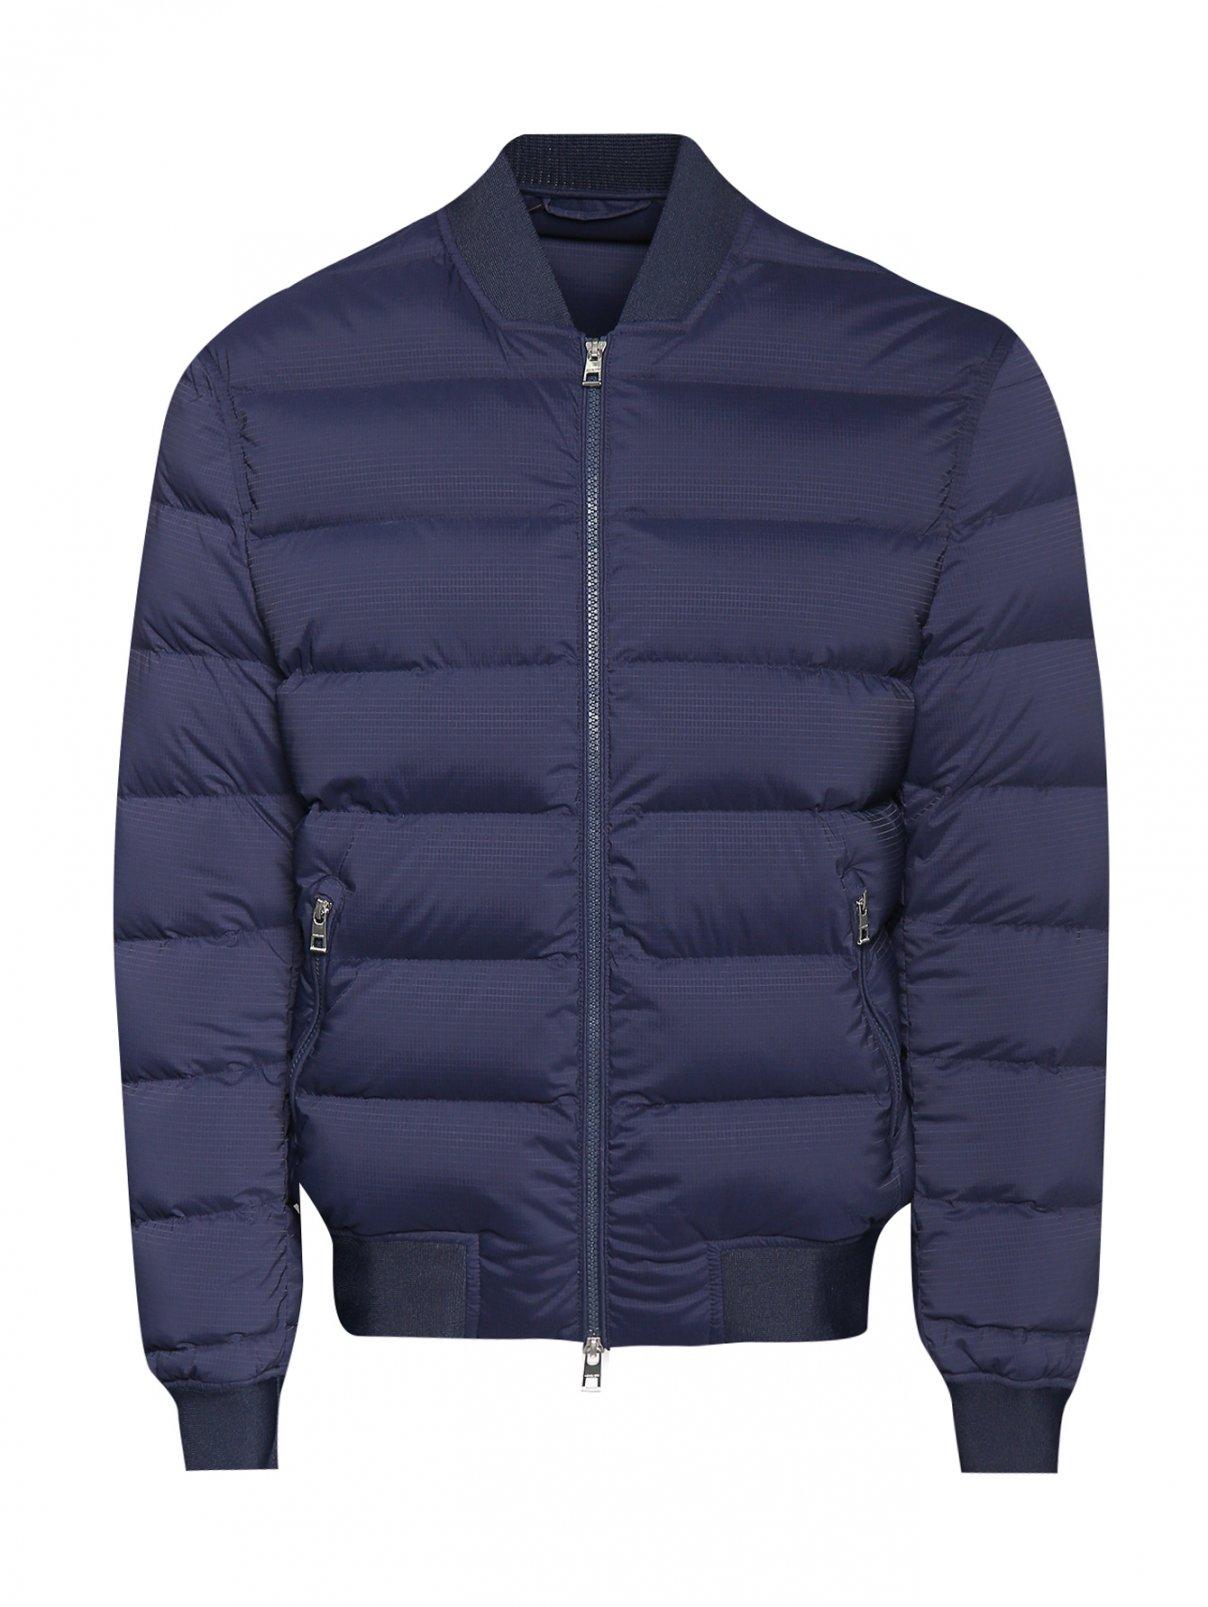 Куртка  стеганая на молнии Michael by Michael Kors  –  Общий вид  – Цвет:  Синий